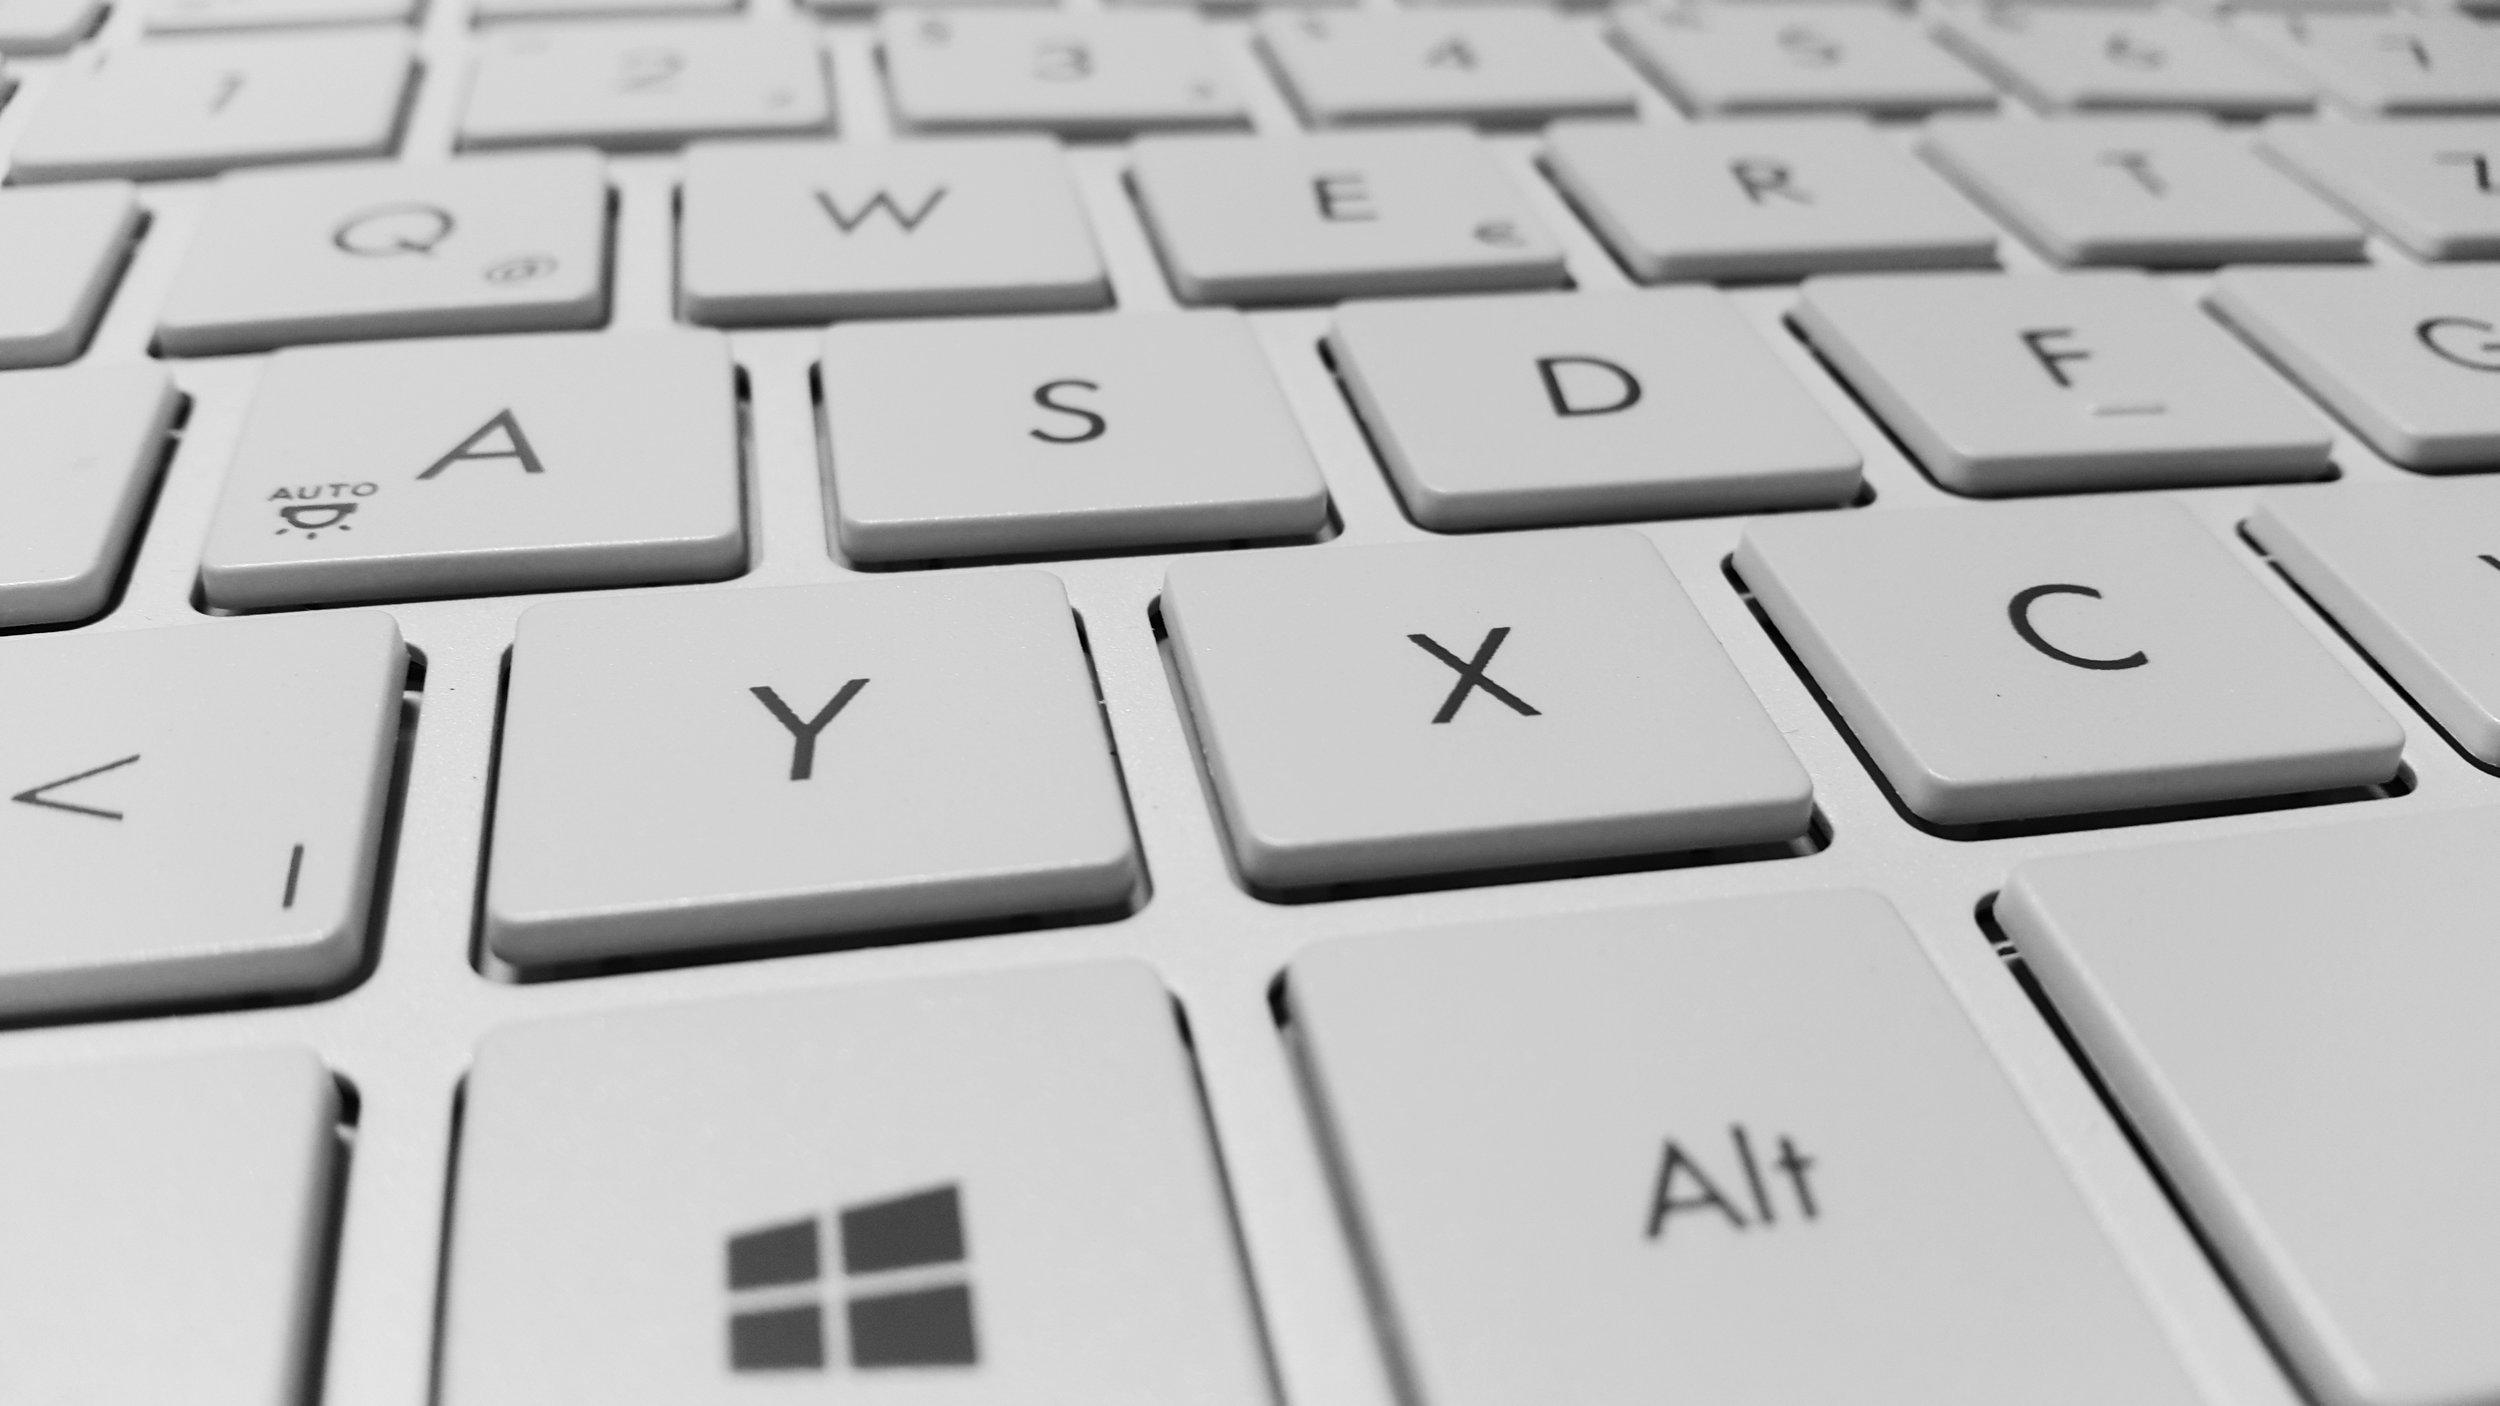 keyboard-computer-keys-white.jpg